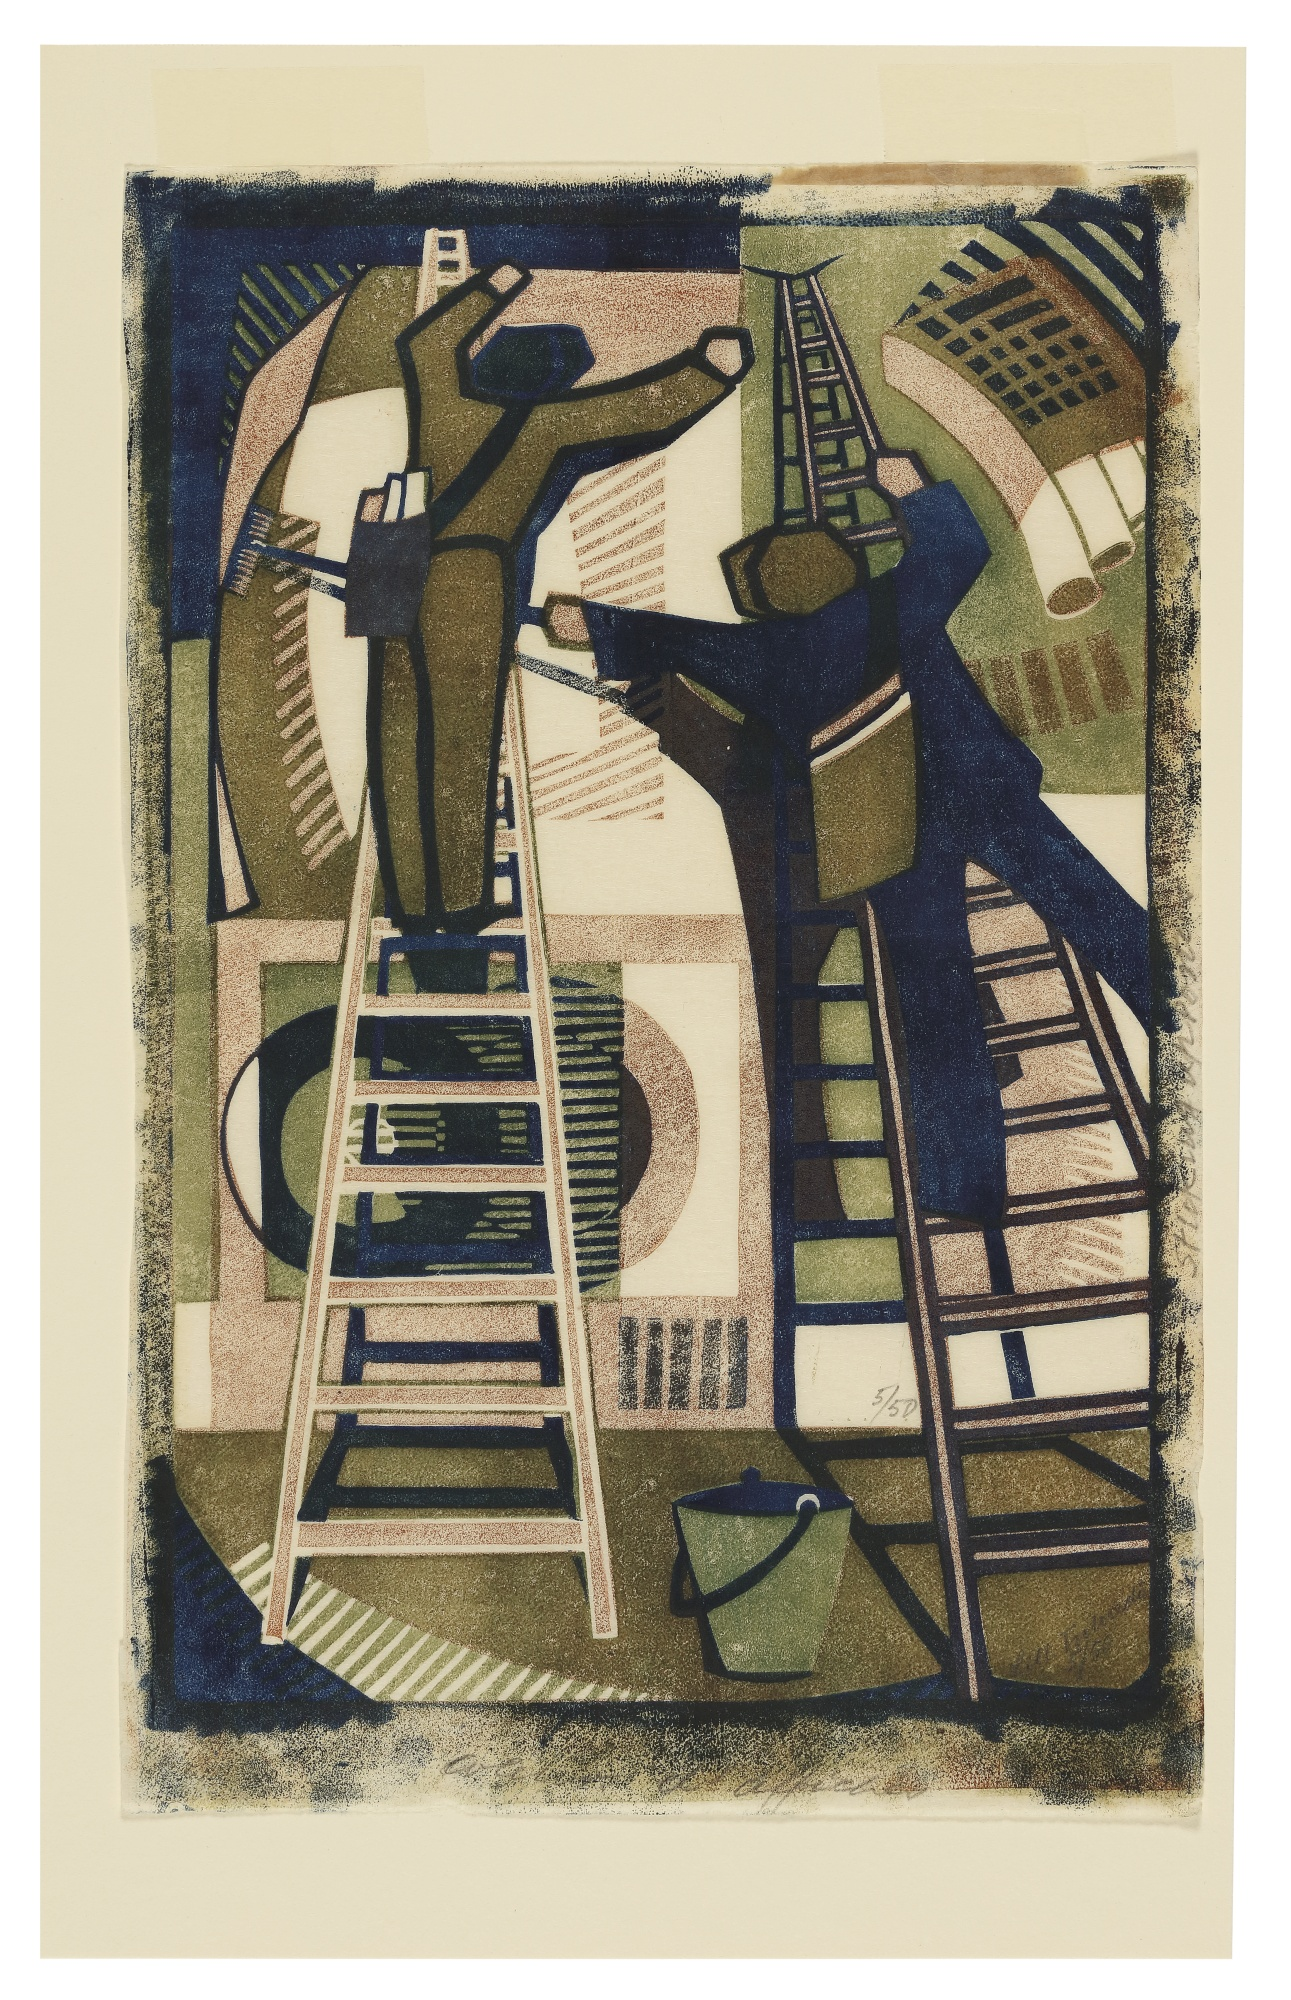 Lill Tschudi-Sticking Up Posters (C. Lt 33)-1933